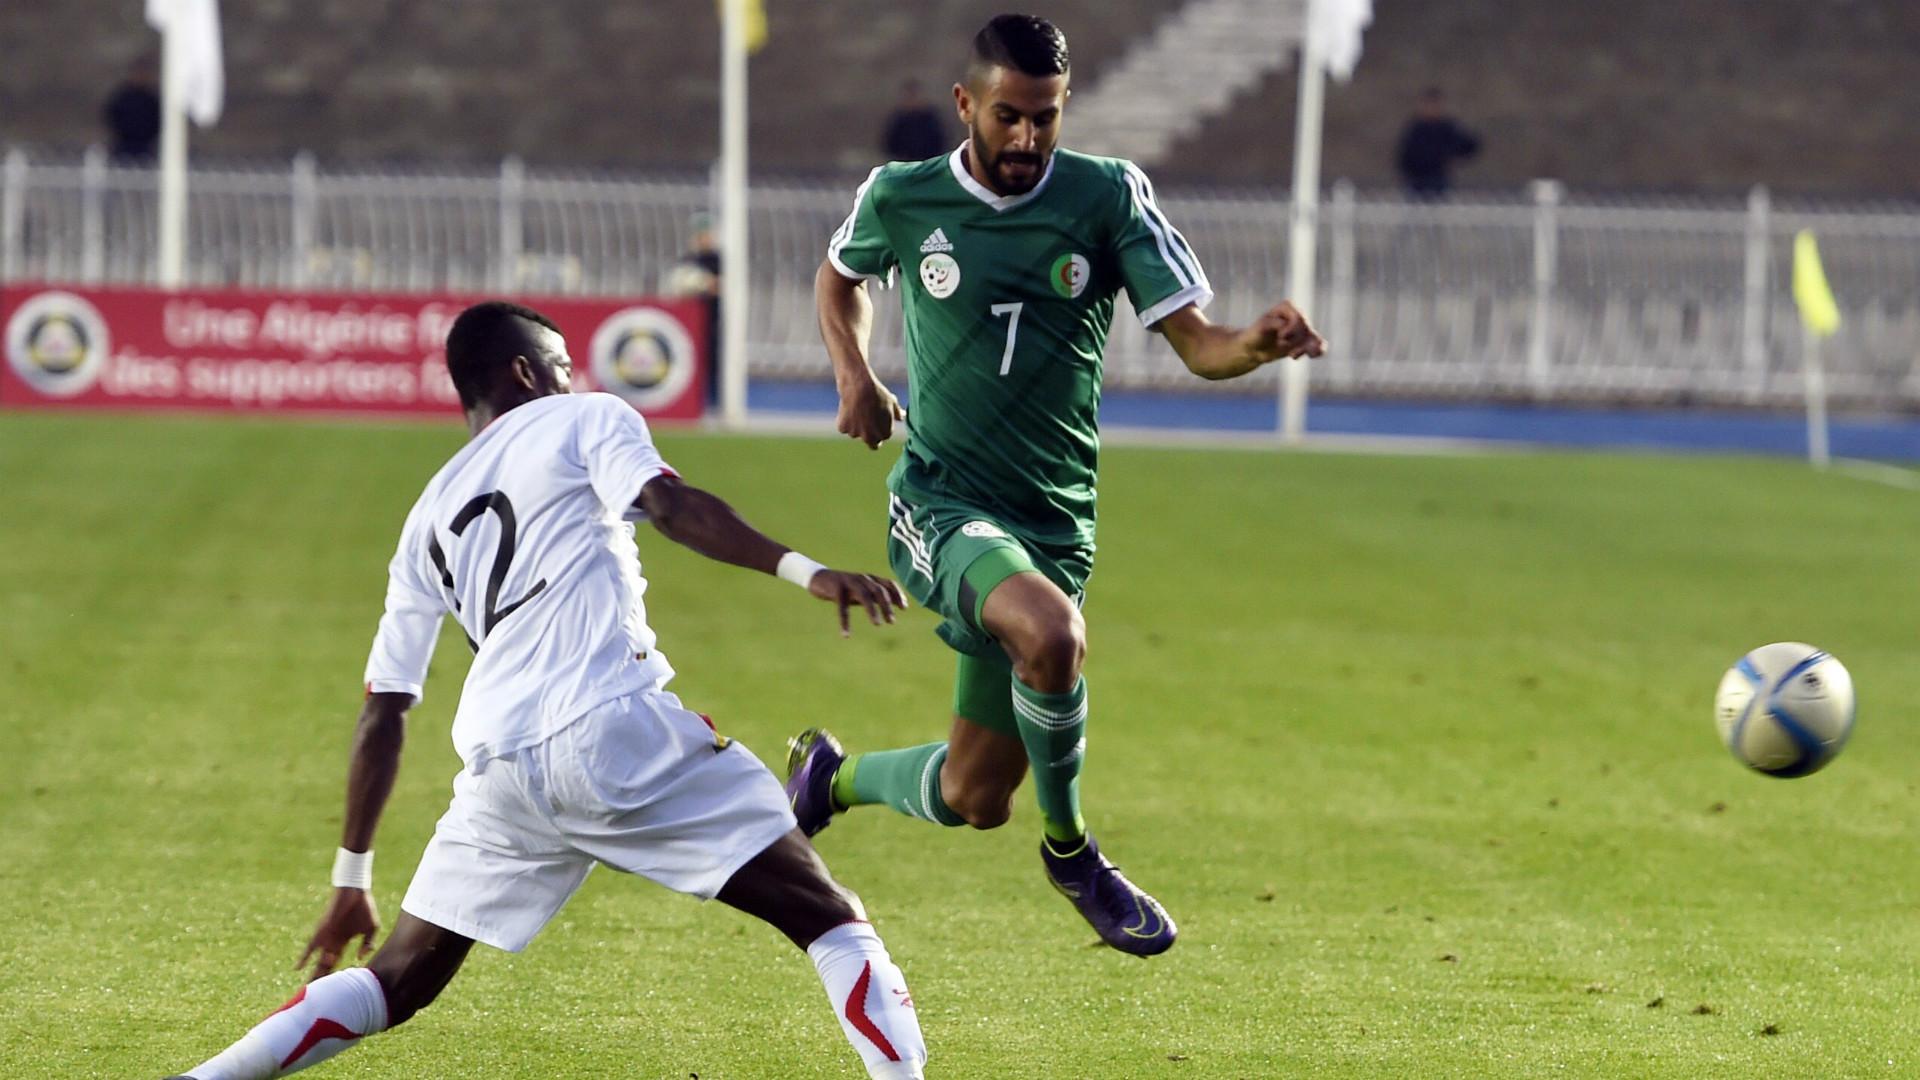 Algeria's Riyad Mahrez: African Player of the Year is between Sadio Mane and Mohamed Salah